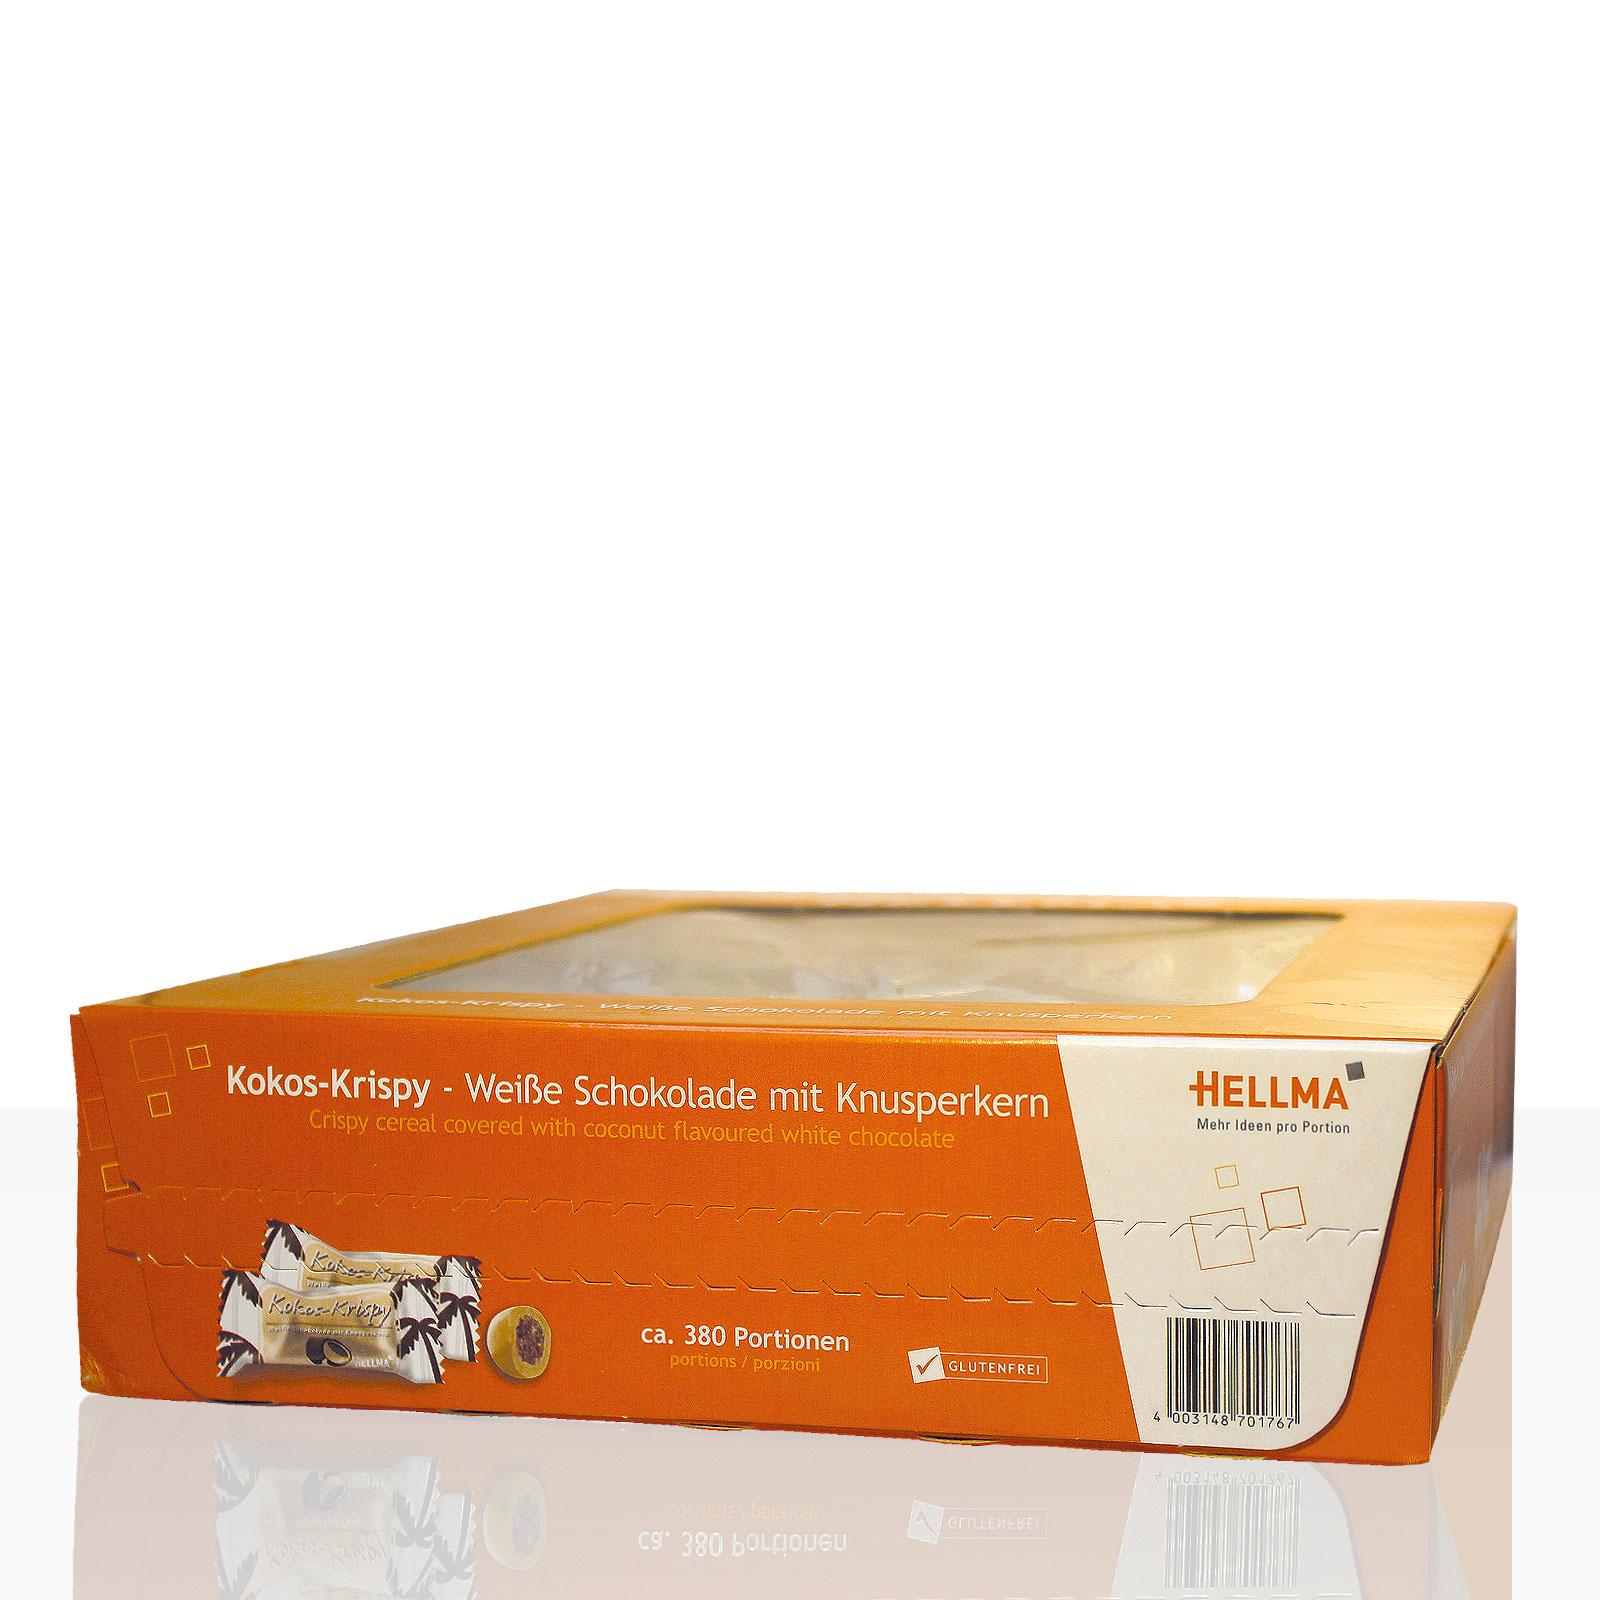 Hellma Kokos Krispy weiße Schokolade mit Knusperkern ca. 380 Stk